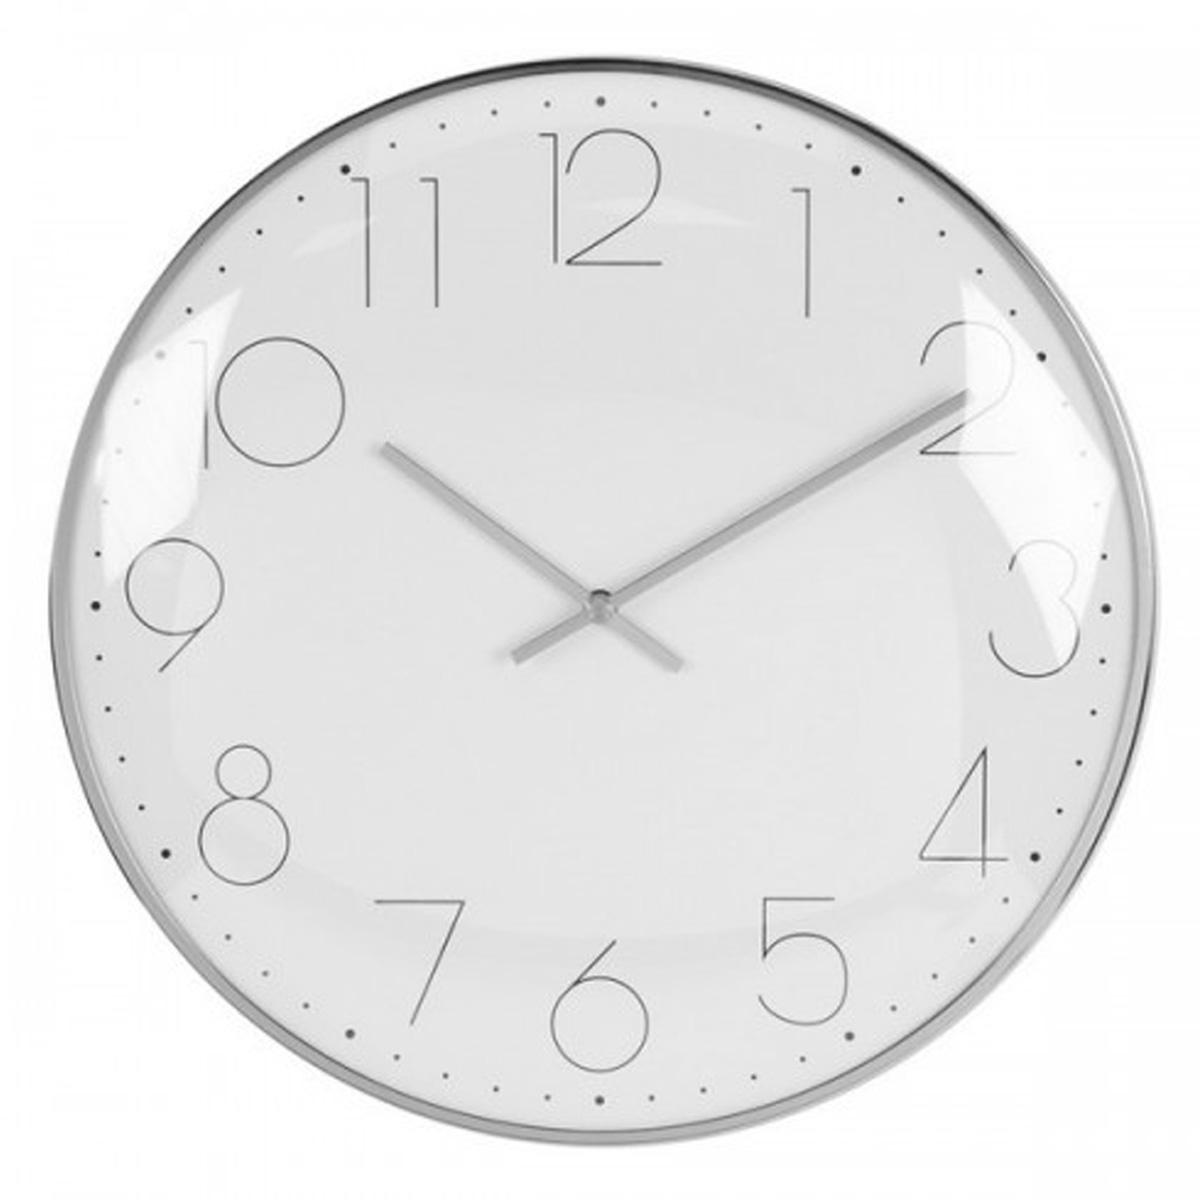 Horloge Murale \'Design\' argenté blanc - 30 cm - [Q6481]